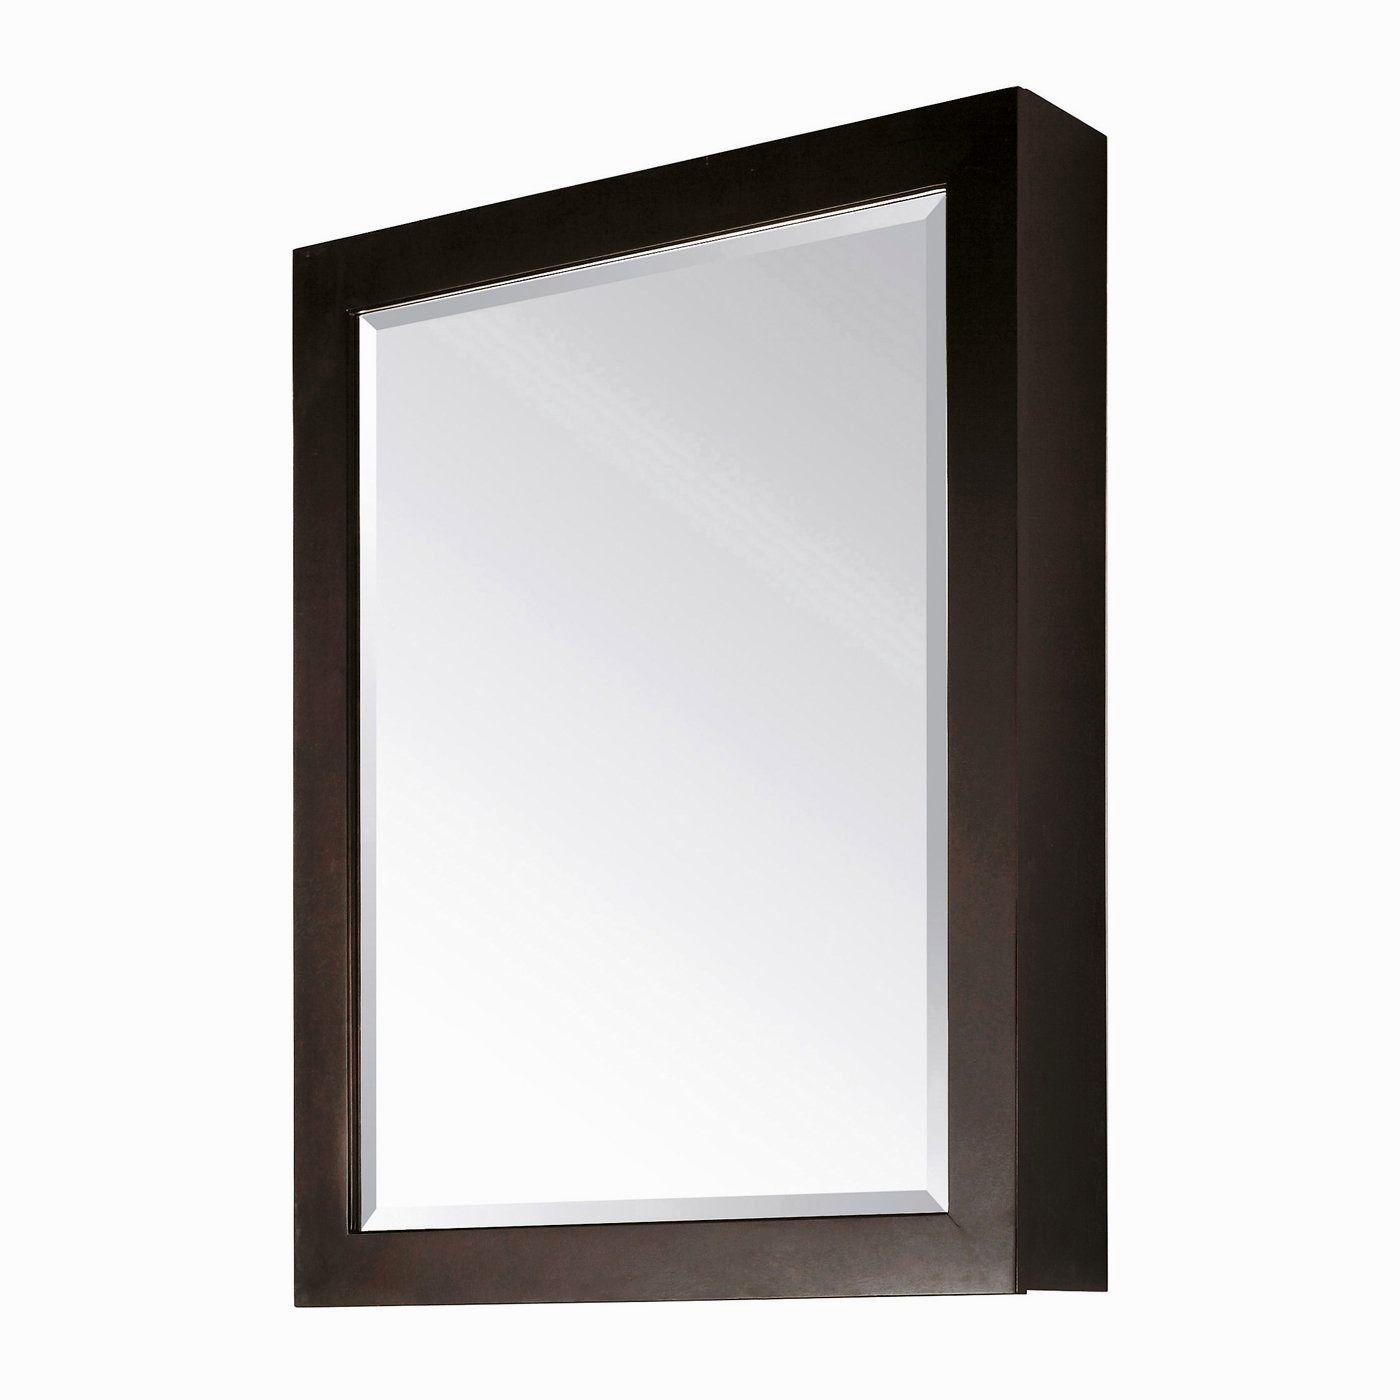 new 30 bathroom vanity collection-Latest 30 Bathroom Vanity Wallpaper